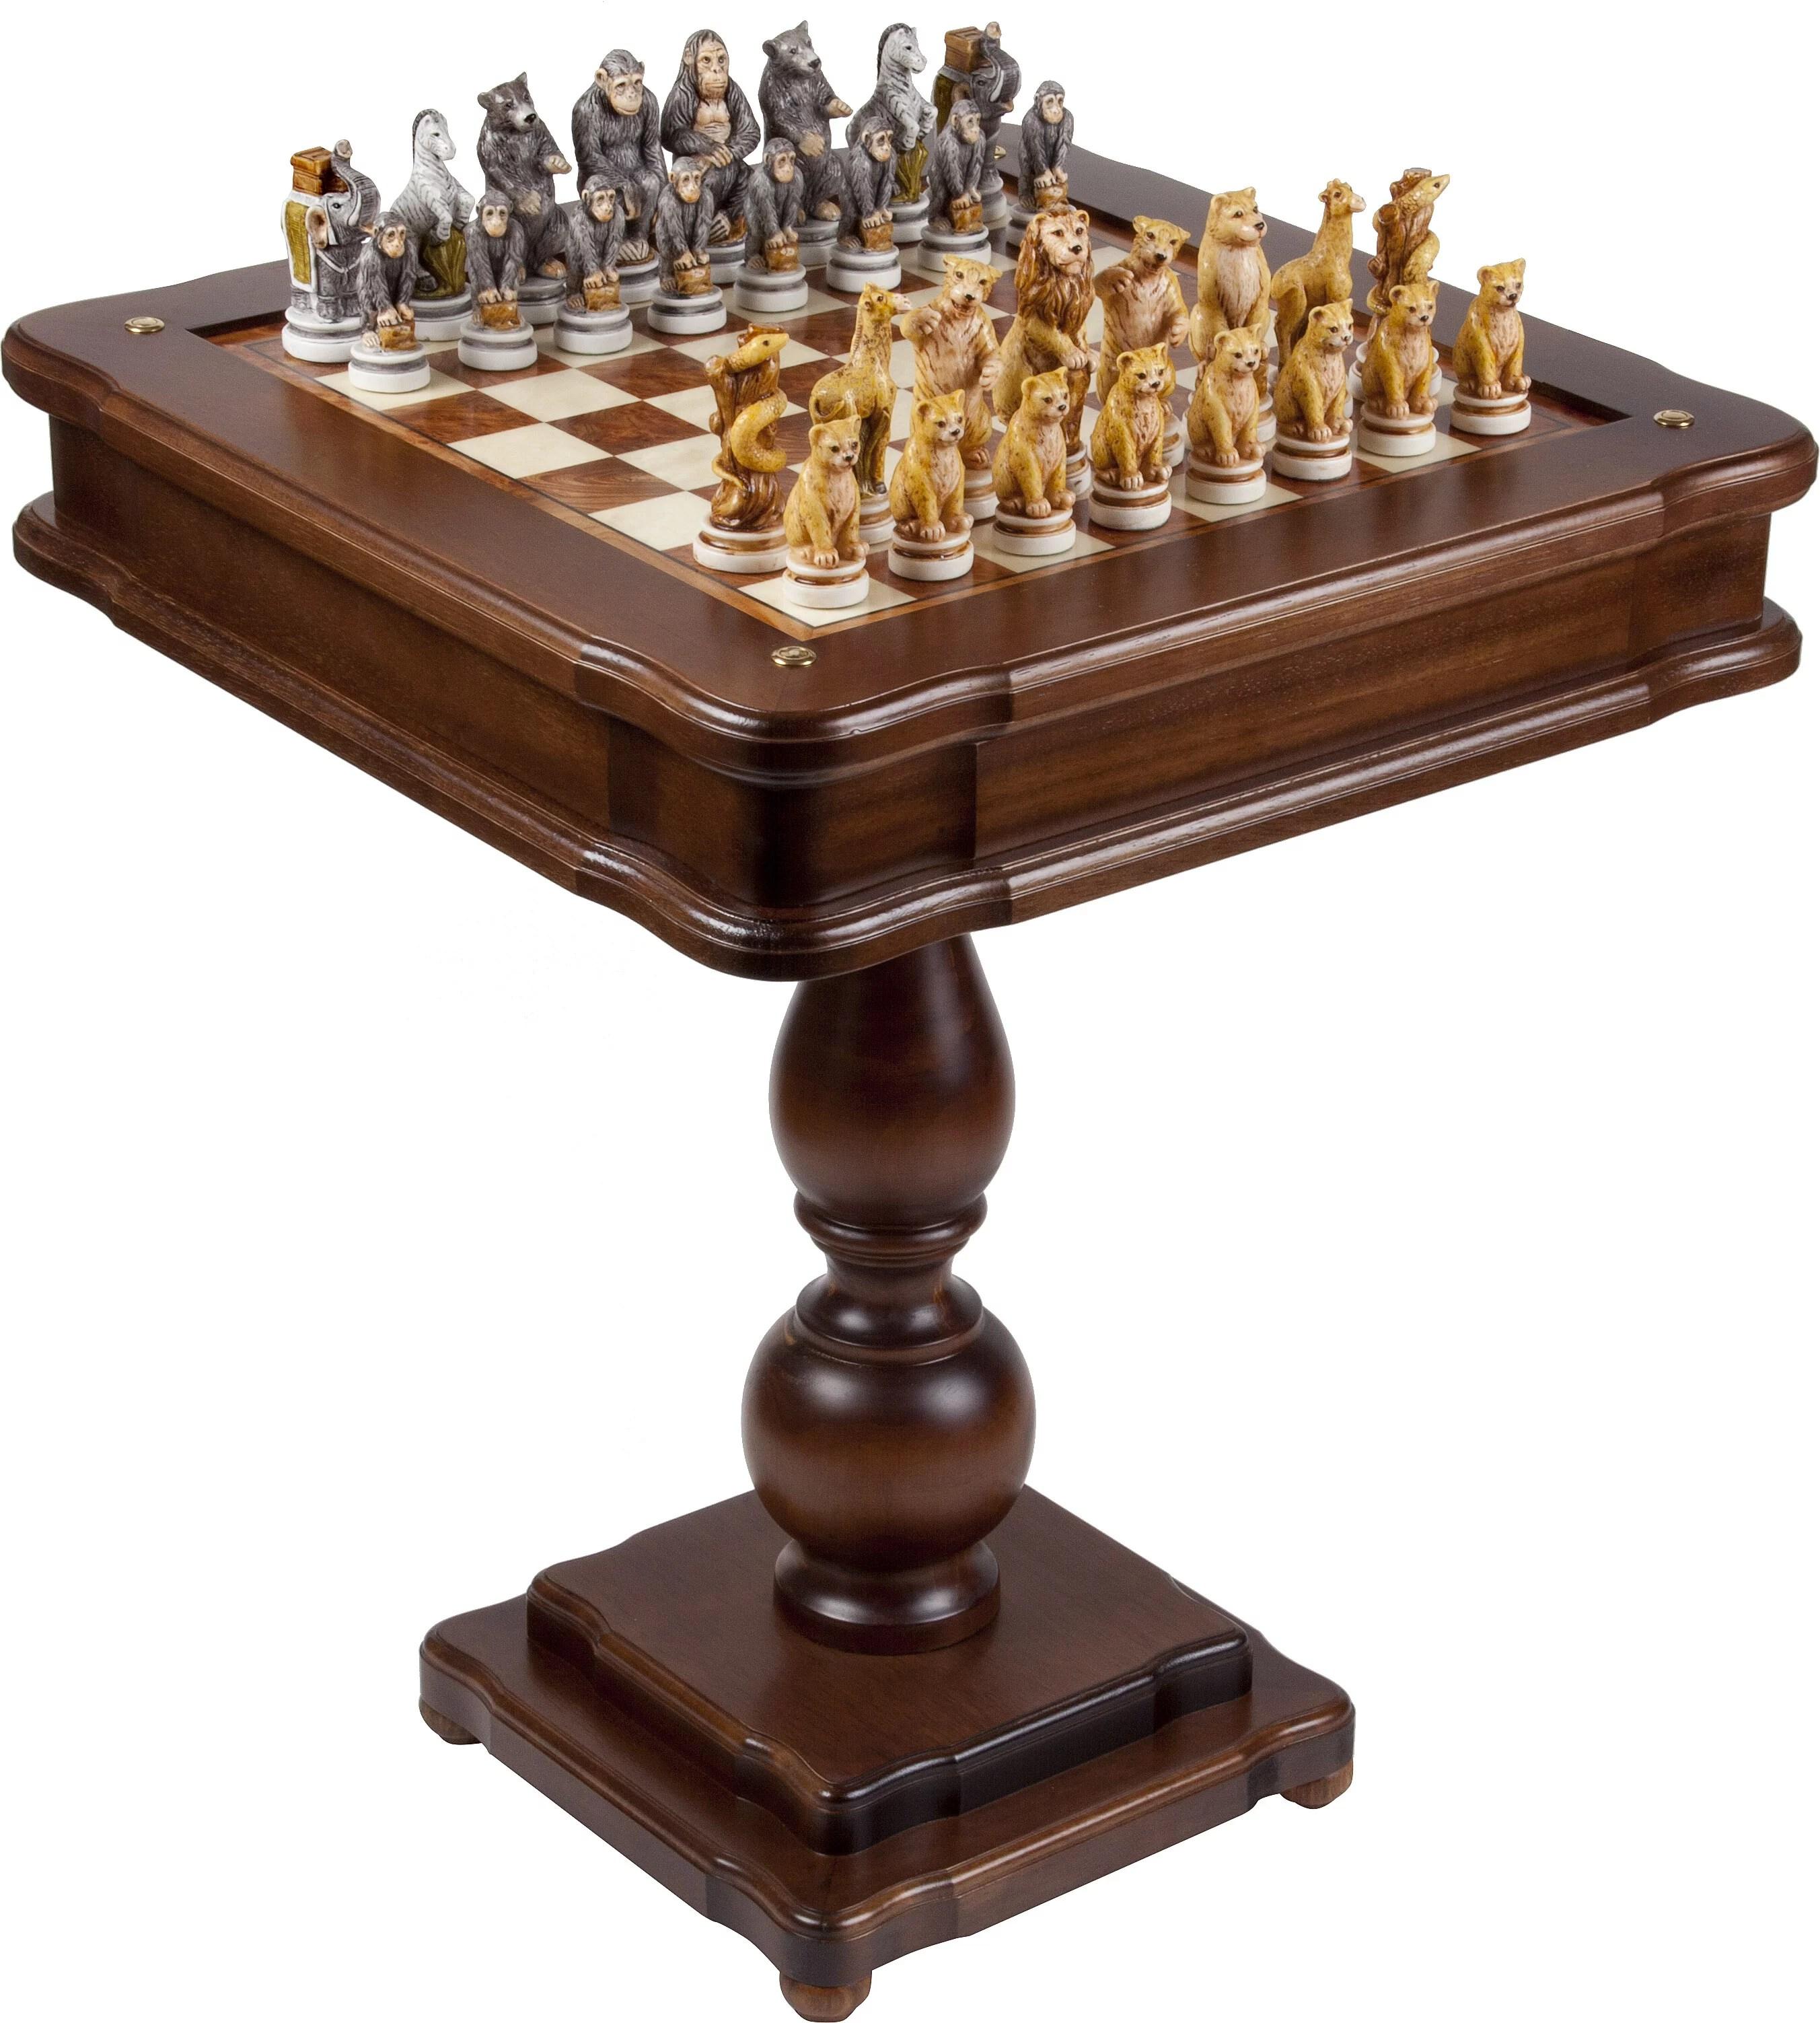 Animal Kingdom Backgammon Chess Checkers Table